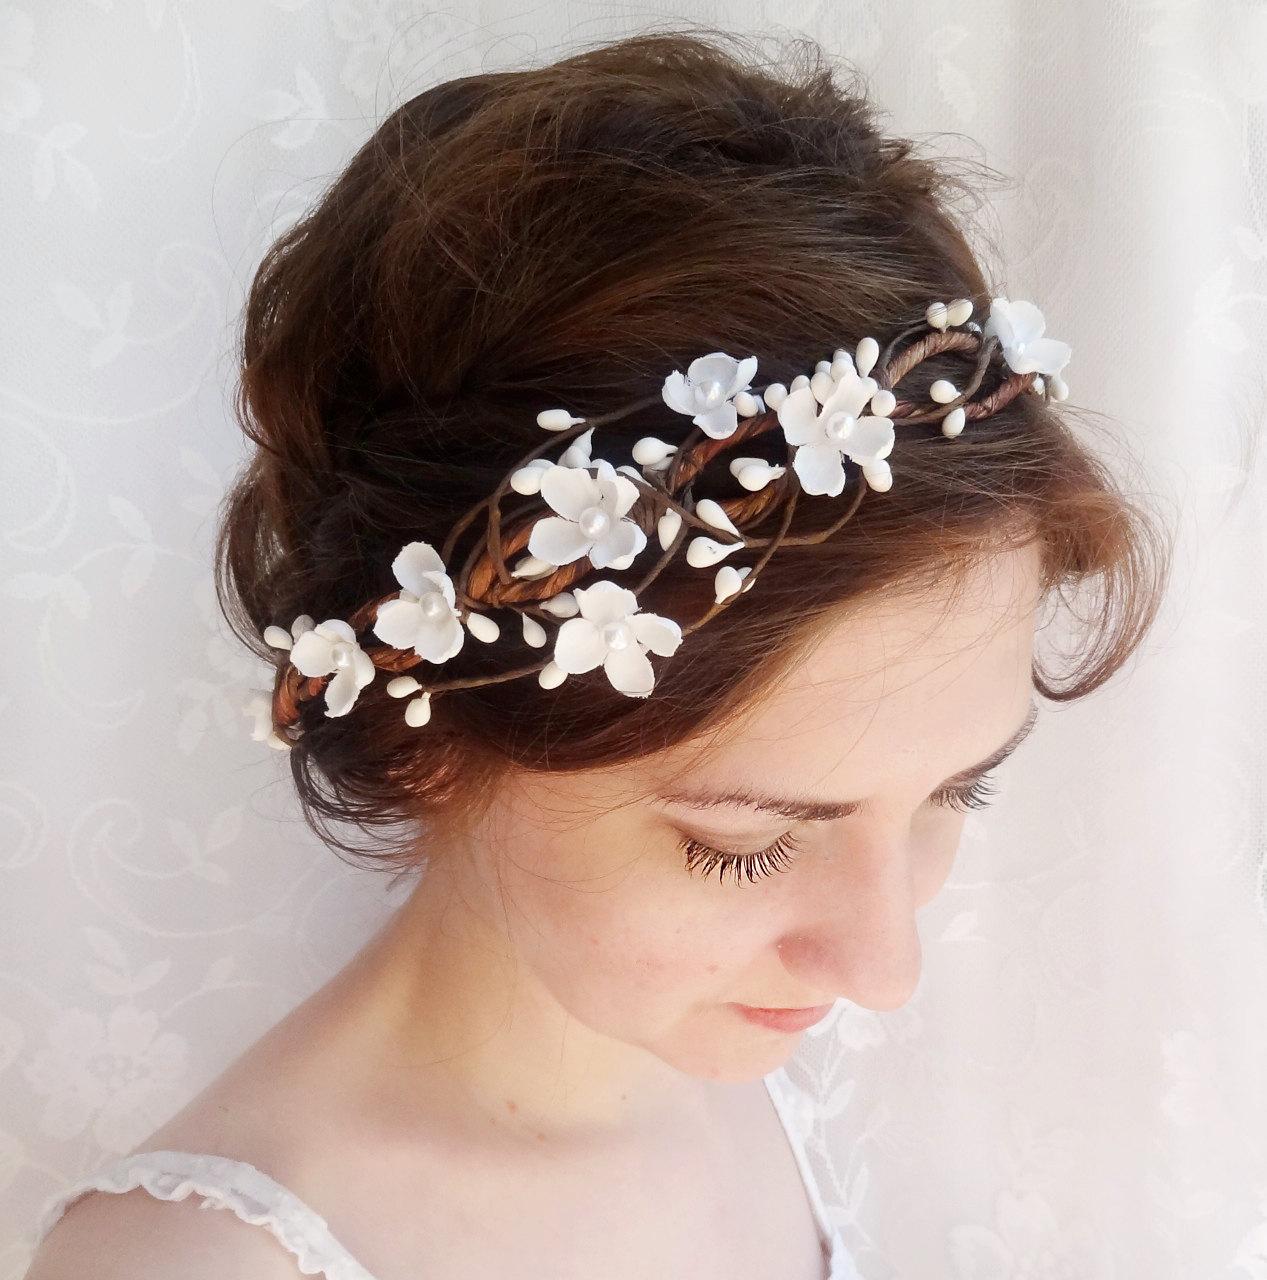 bridal hair accessories wedding flower headpiece white flower crown circlet whimsy rustic wedding flower crown